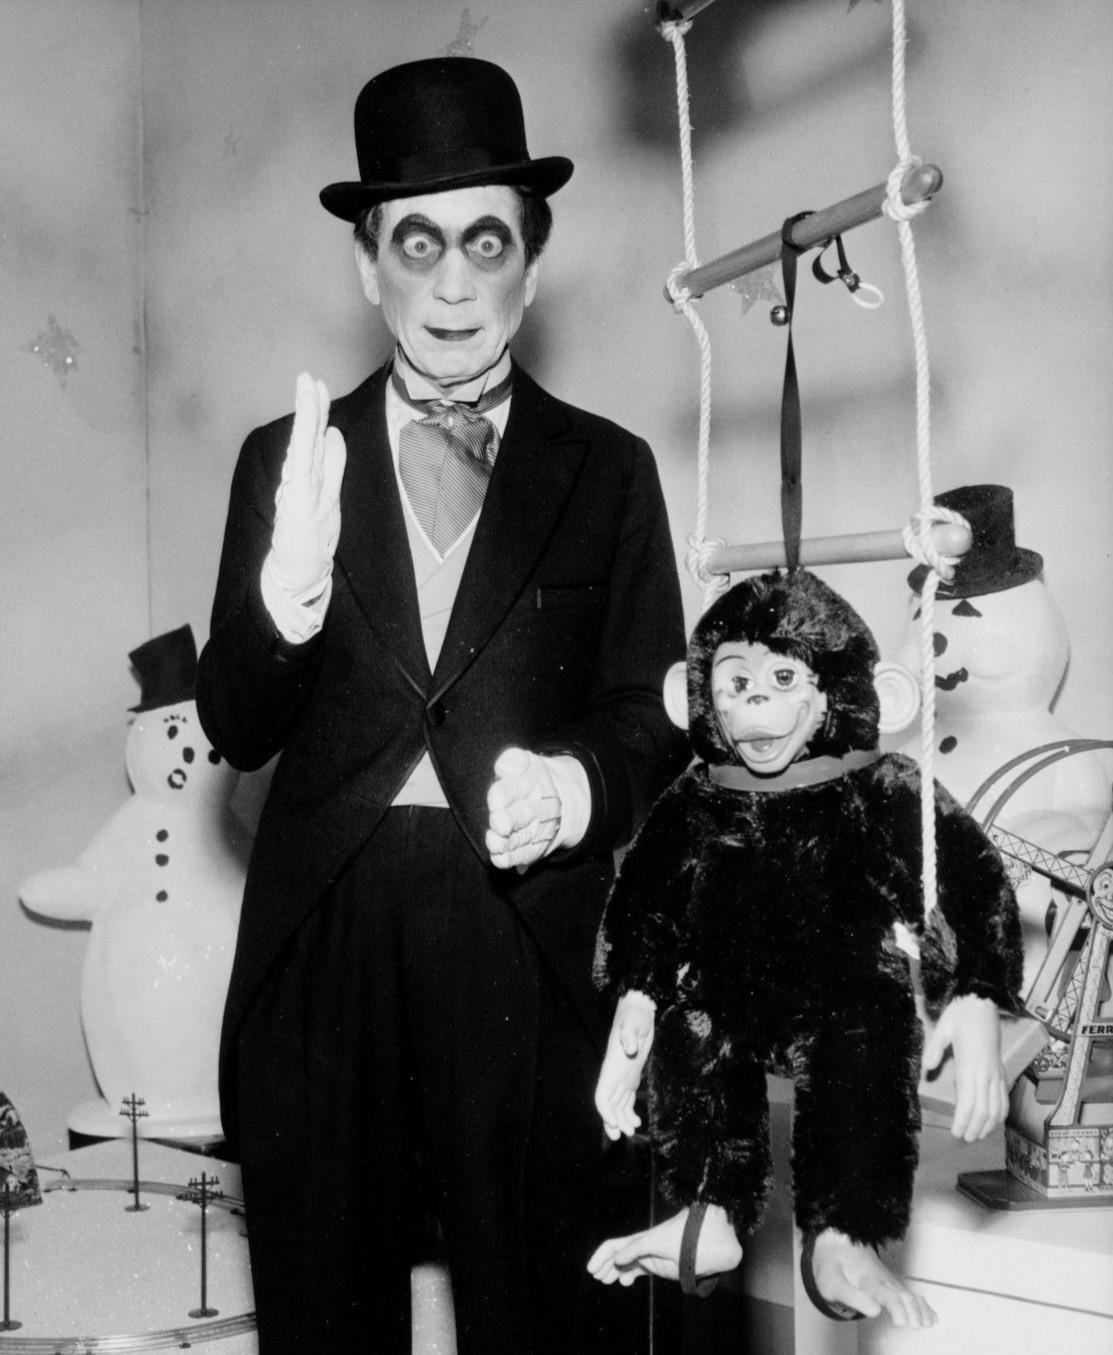 File:Harpo Marx Silent Panic DuPont Show 1960.JPG